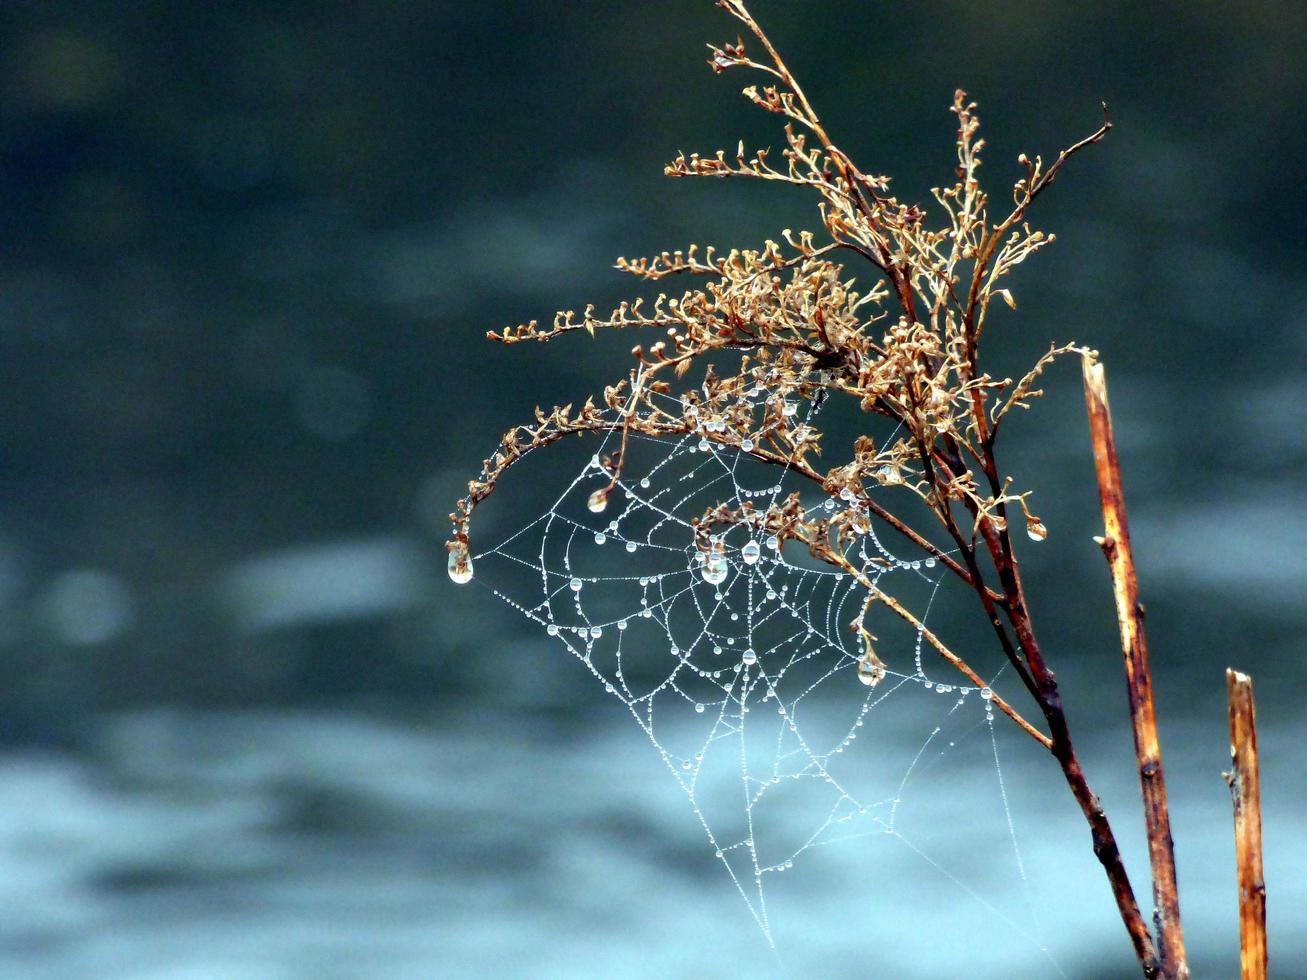 tela de araña cubierta de gotas de lluvia foto